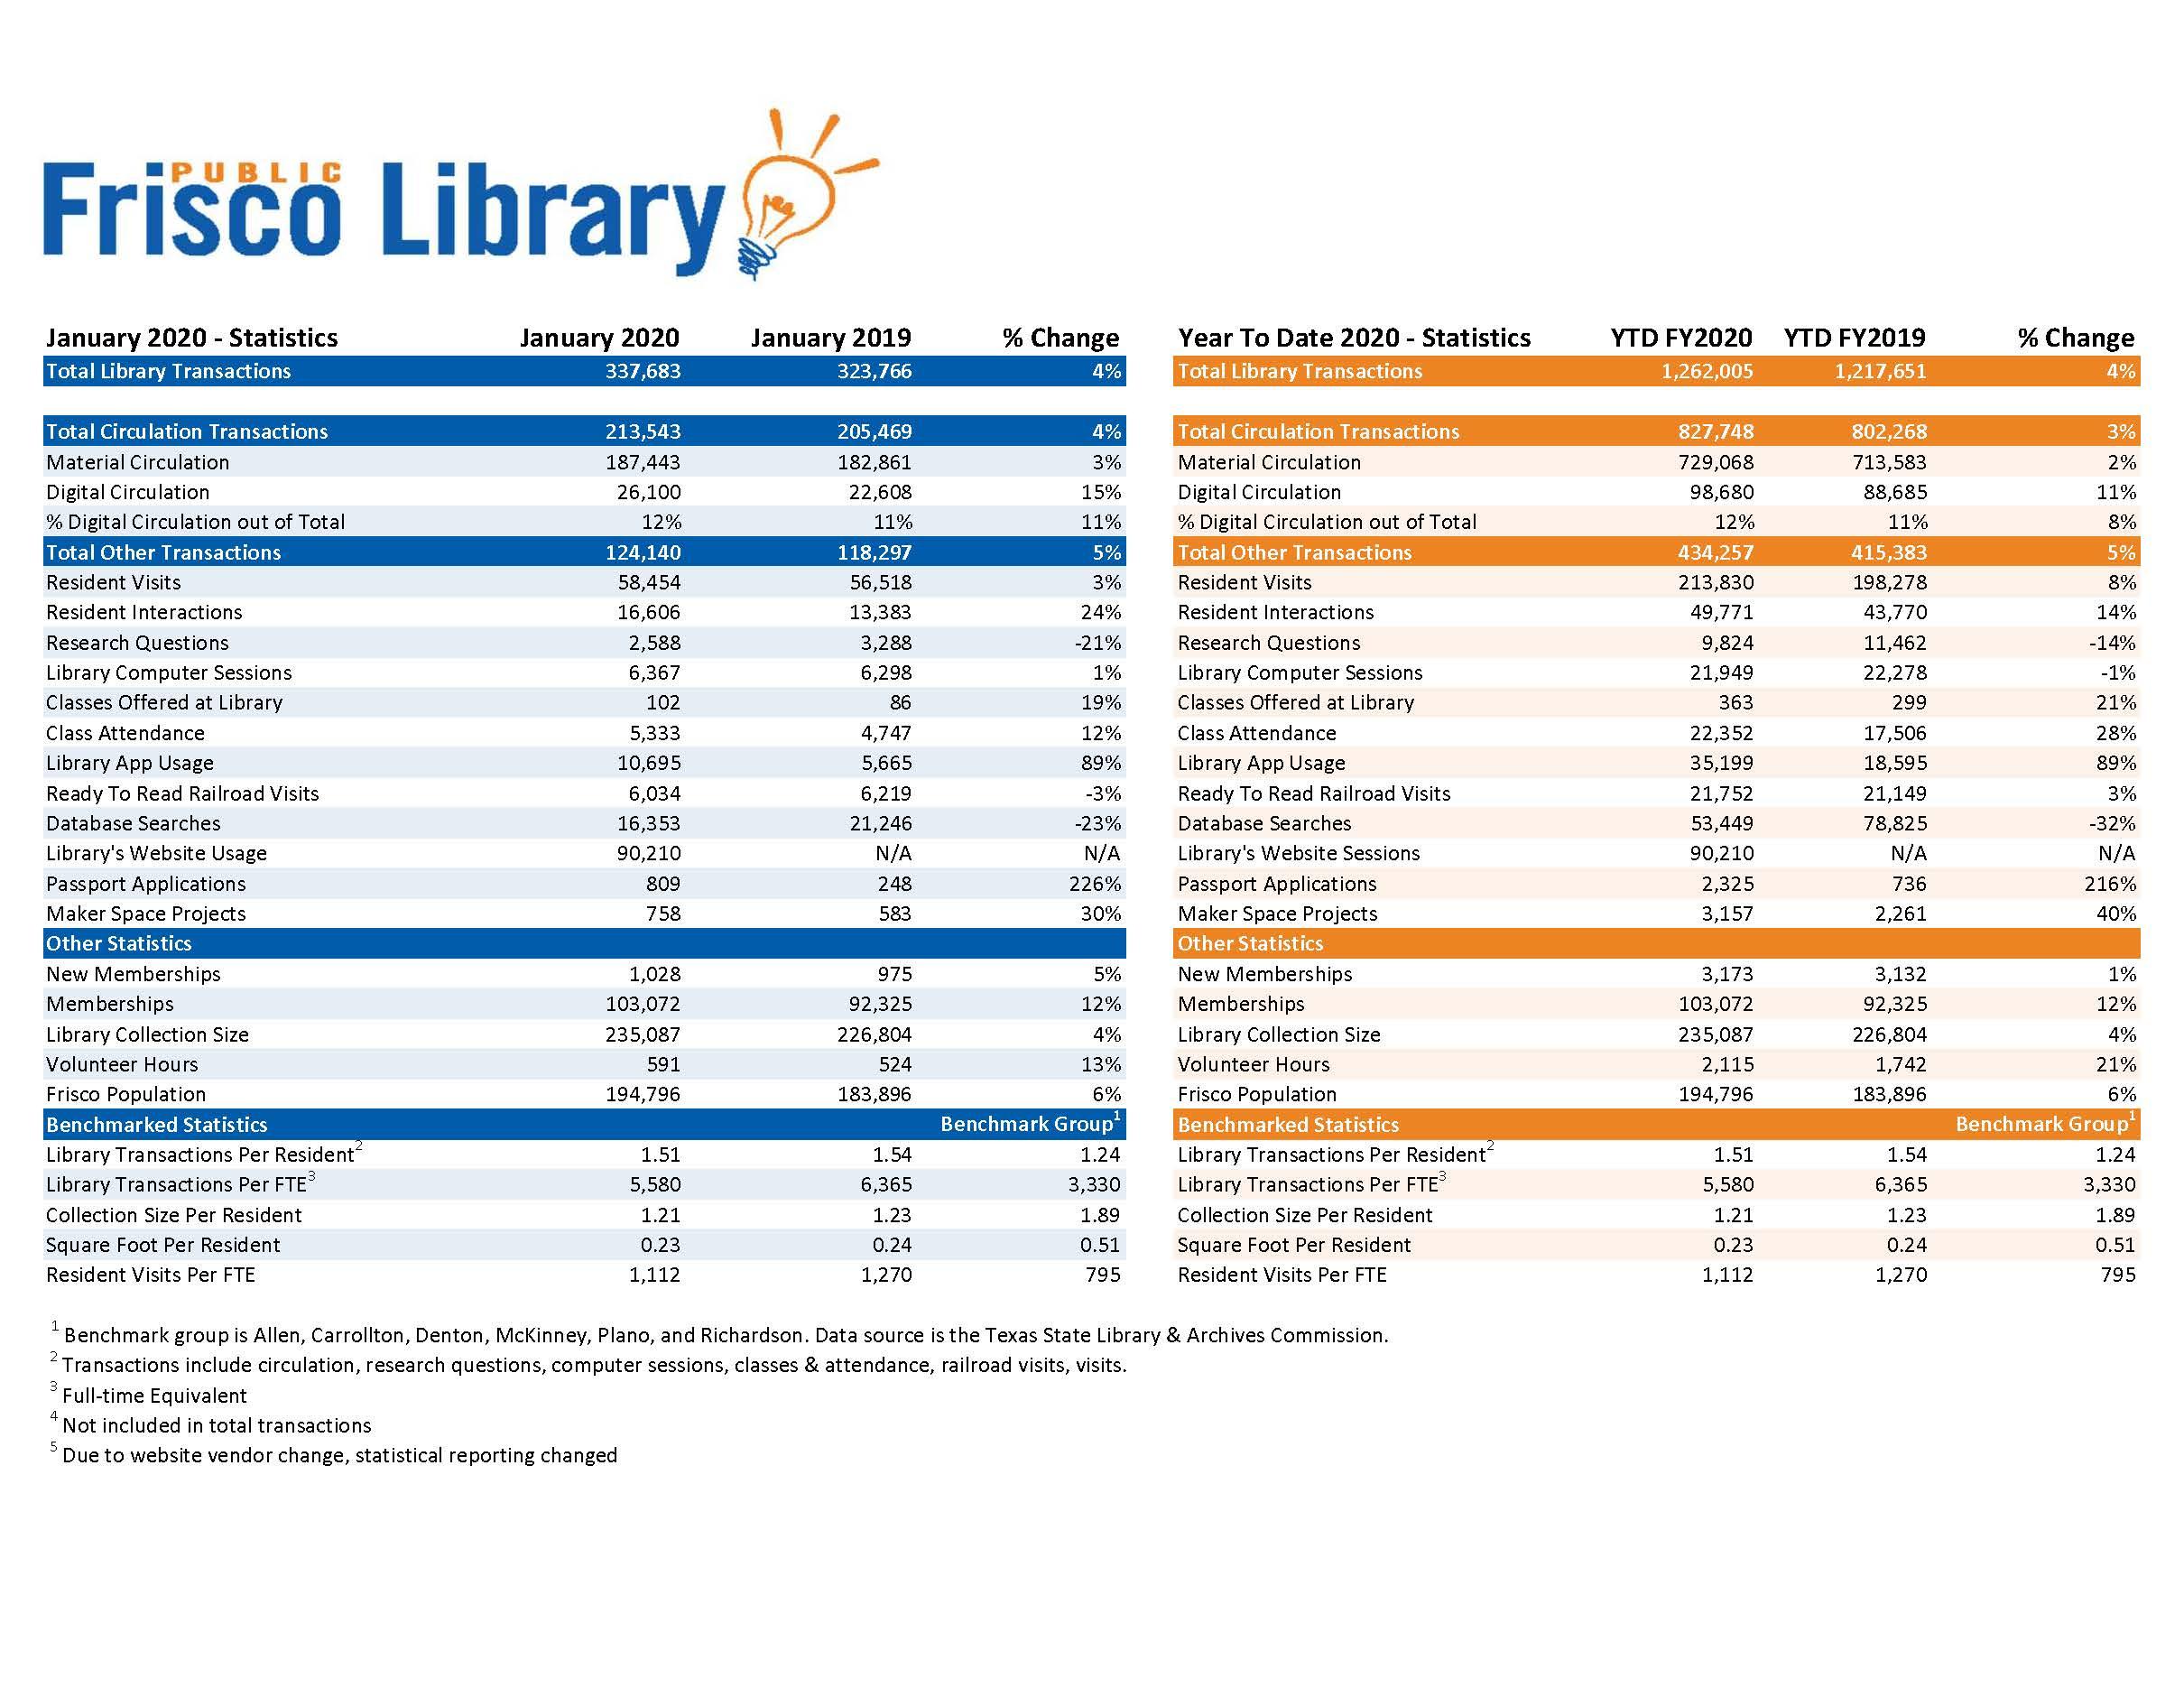 March 2020 Frisco Public Library City Council Report